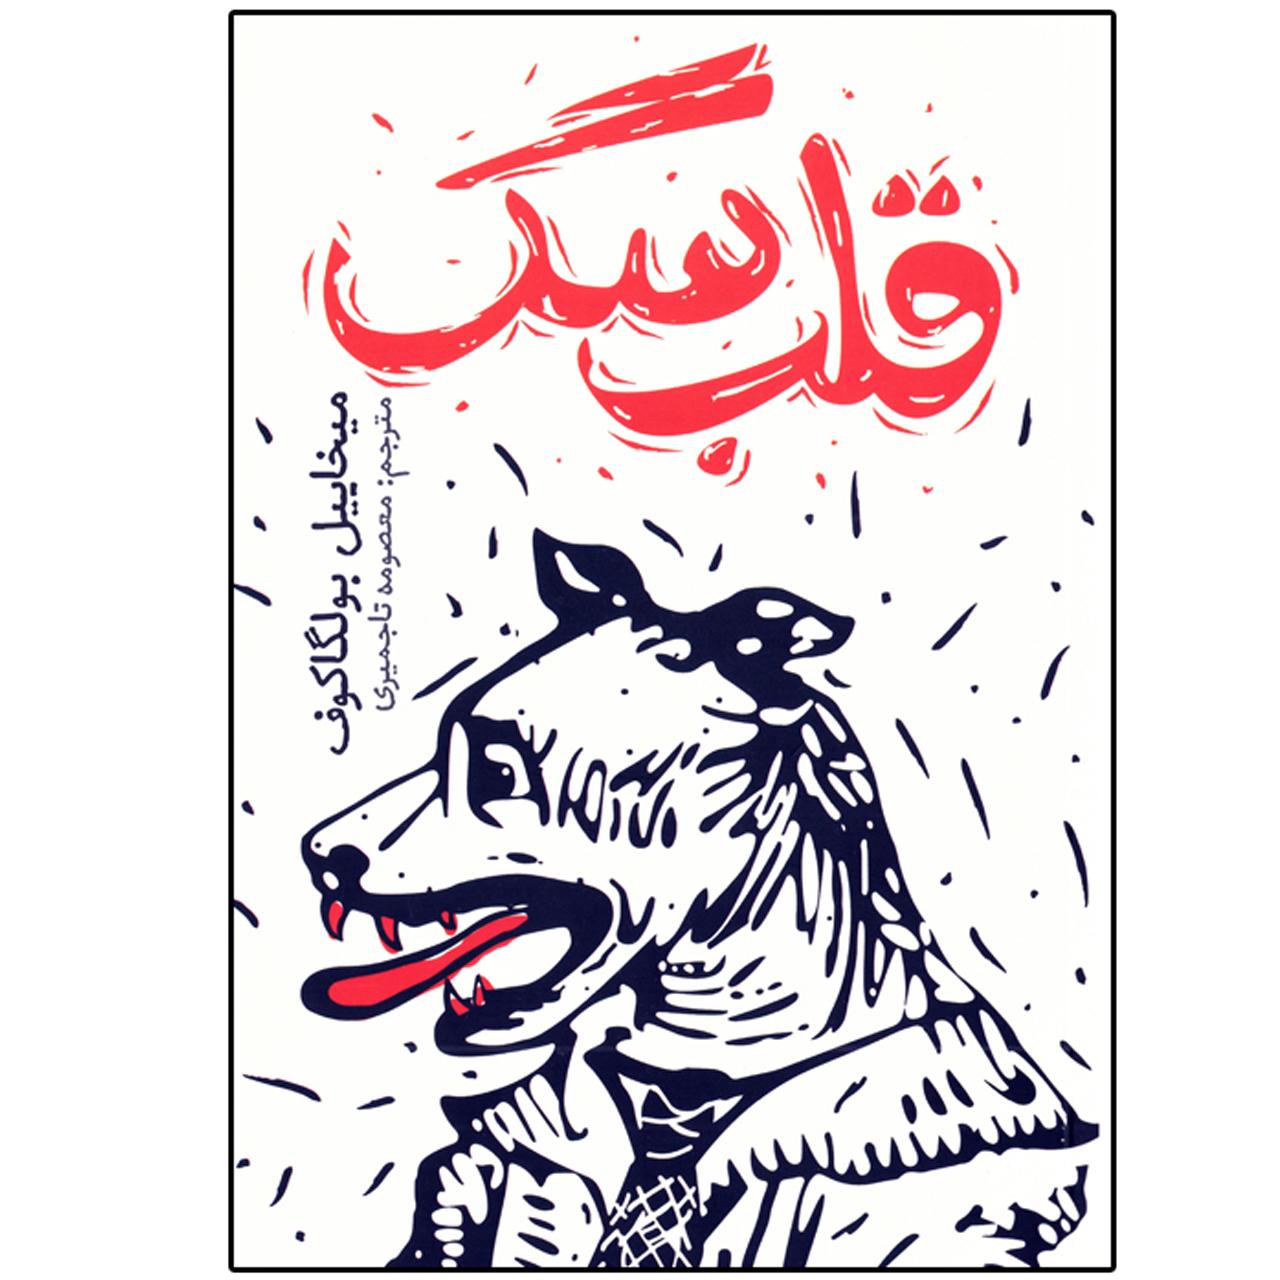 خرید                      کتاب قلب سگ ( دل سگ ) اثر میخاییل بولگاکوف نشر یوشیتا